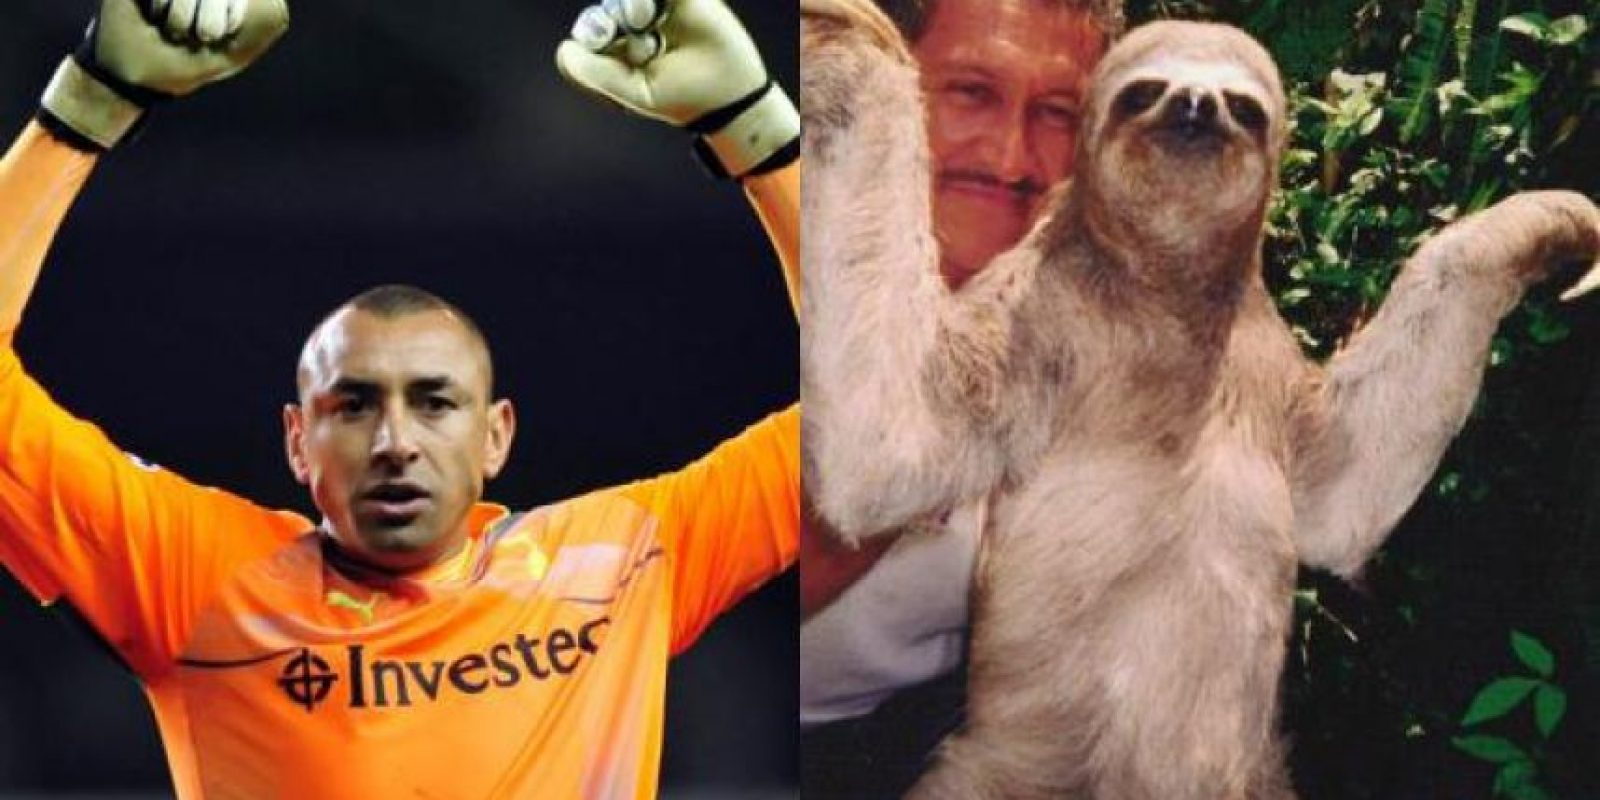 El arquero brasileño Heurelho Gomes tiene hasta la misma pose que este perezoso. Foto:http://footyjokes.net